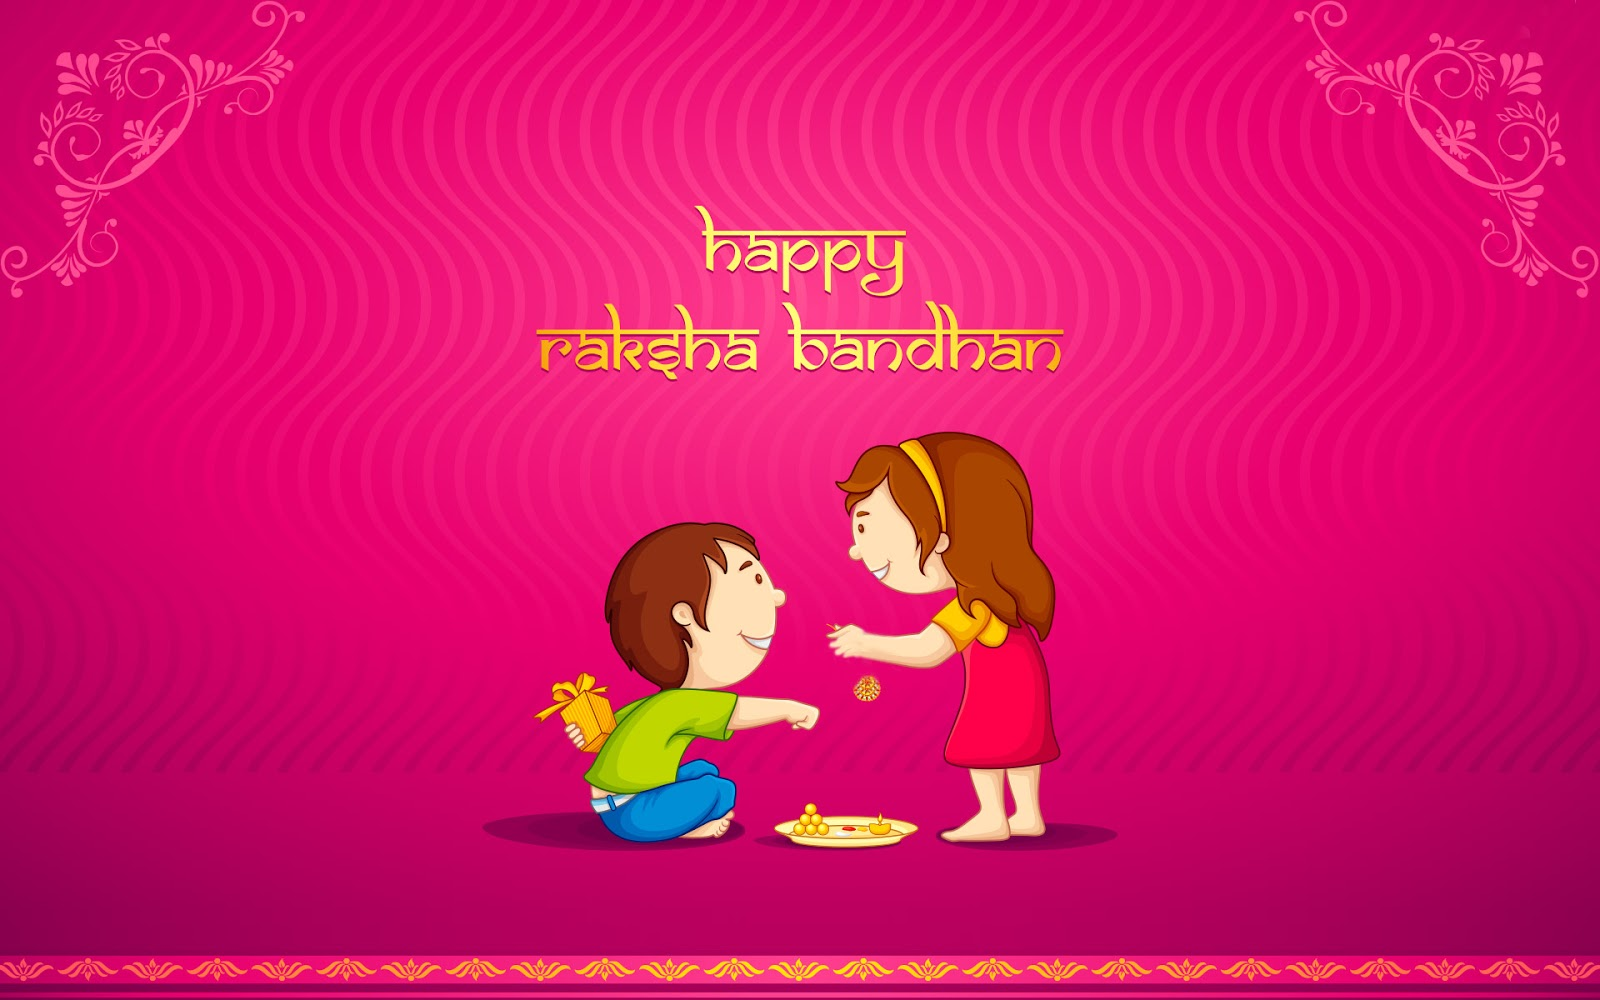 Wallpaper download for whatsapp - Download Raksha Bandhan Hd Image